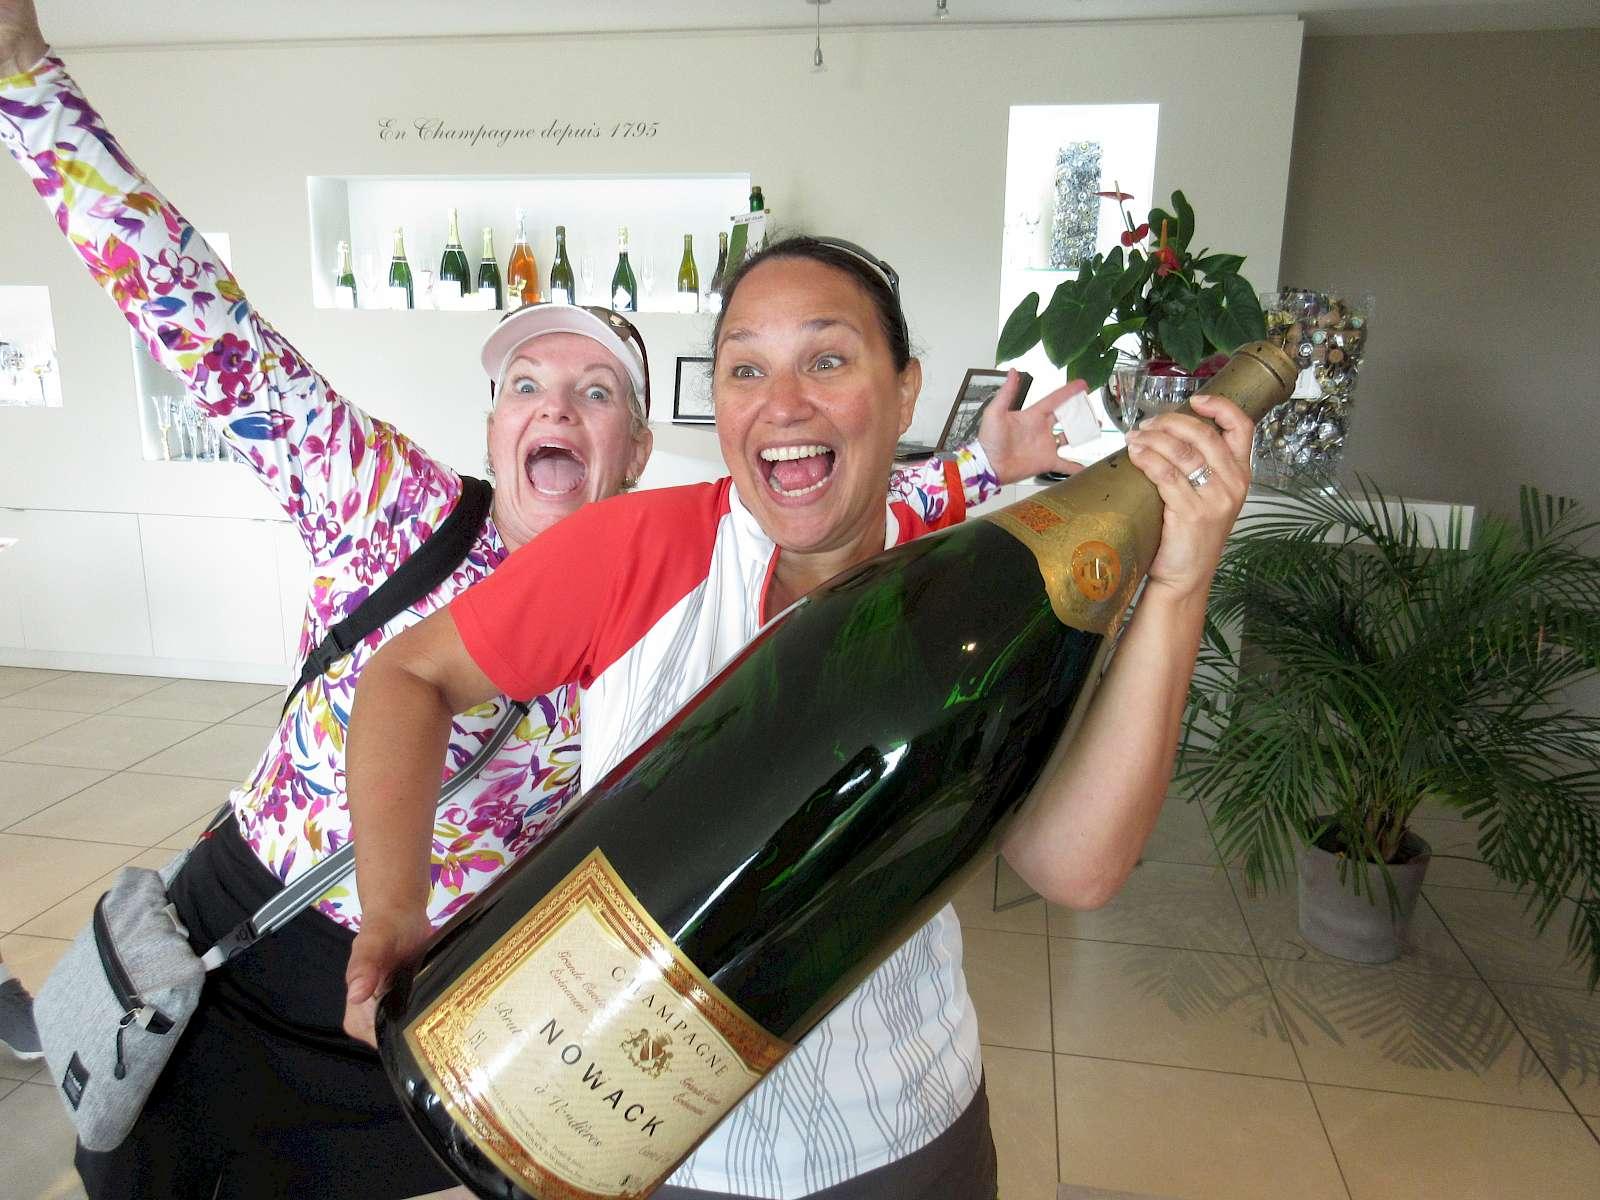 Big bottle of champagne